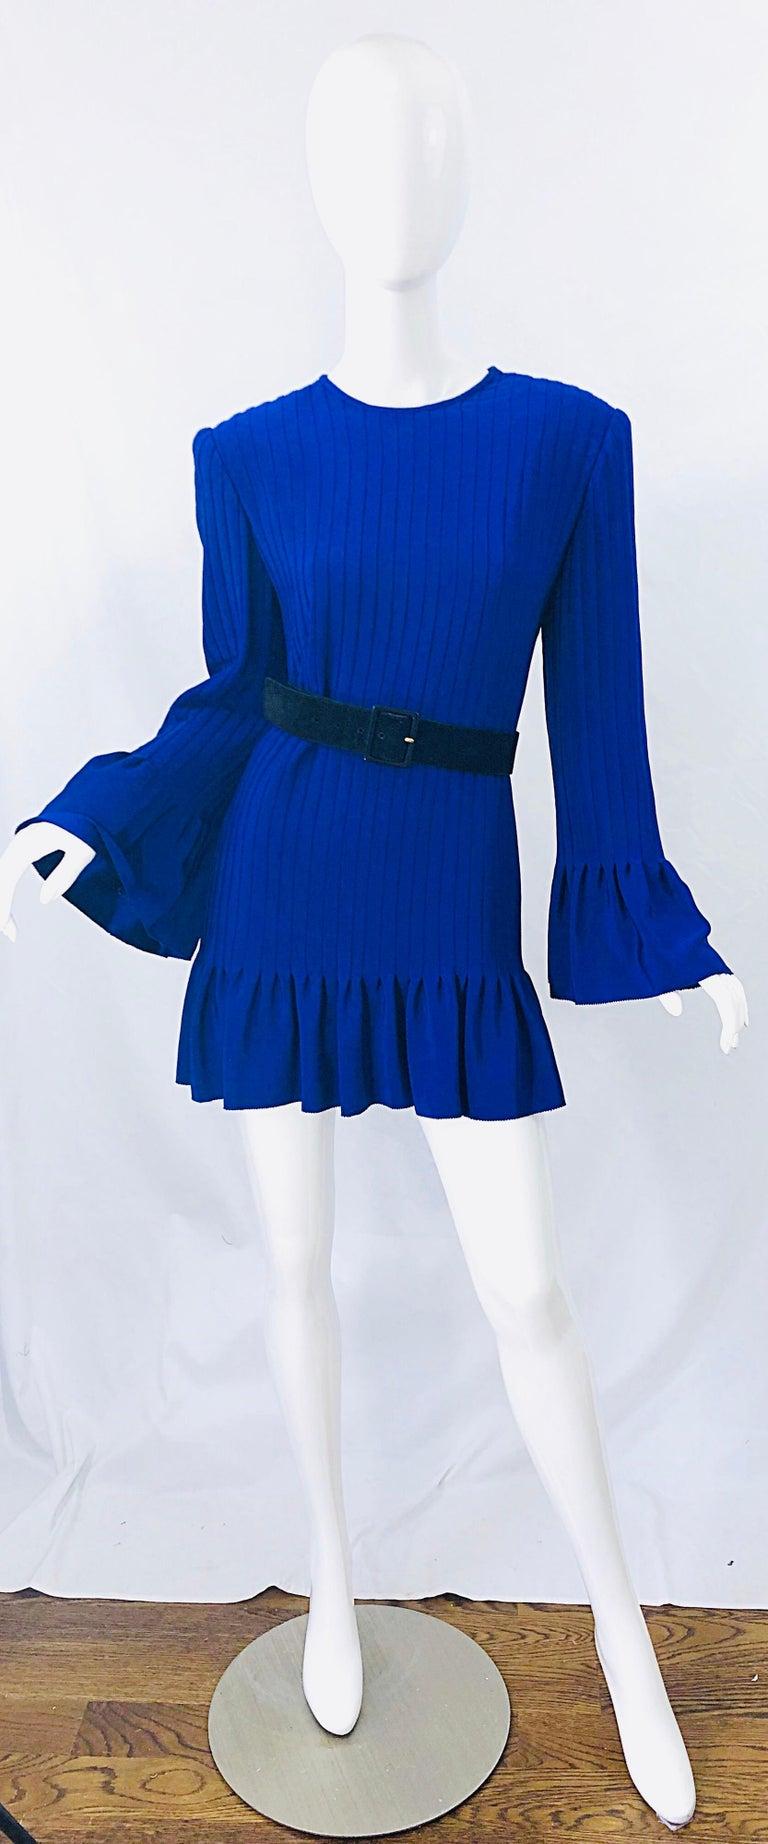 Women's Vintage Tarquin Ebker Royal Blue 1980s Silk Pleated 80s Mini Dress Tunic Shirt For Sale